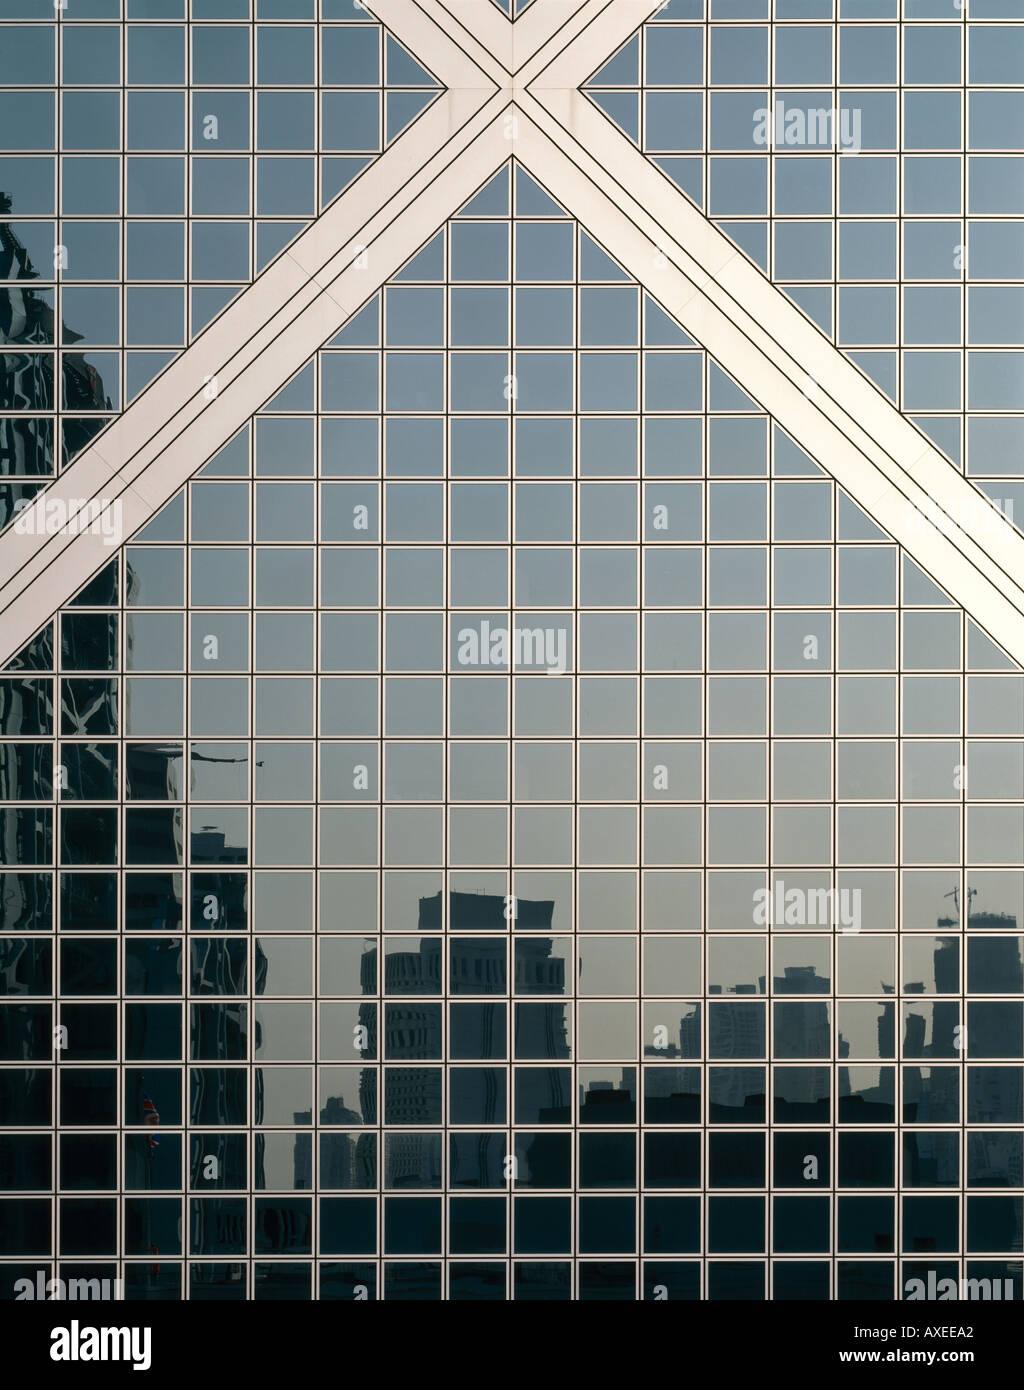 El Banco de China, Hong Kong, China, 1985-1990. Detalle exterior. Arquitecto: Pei, Cobb Freed y arquitectos Imagen De Stock